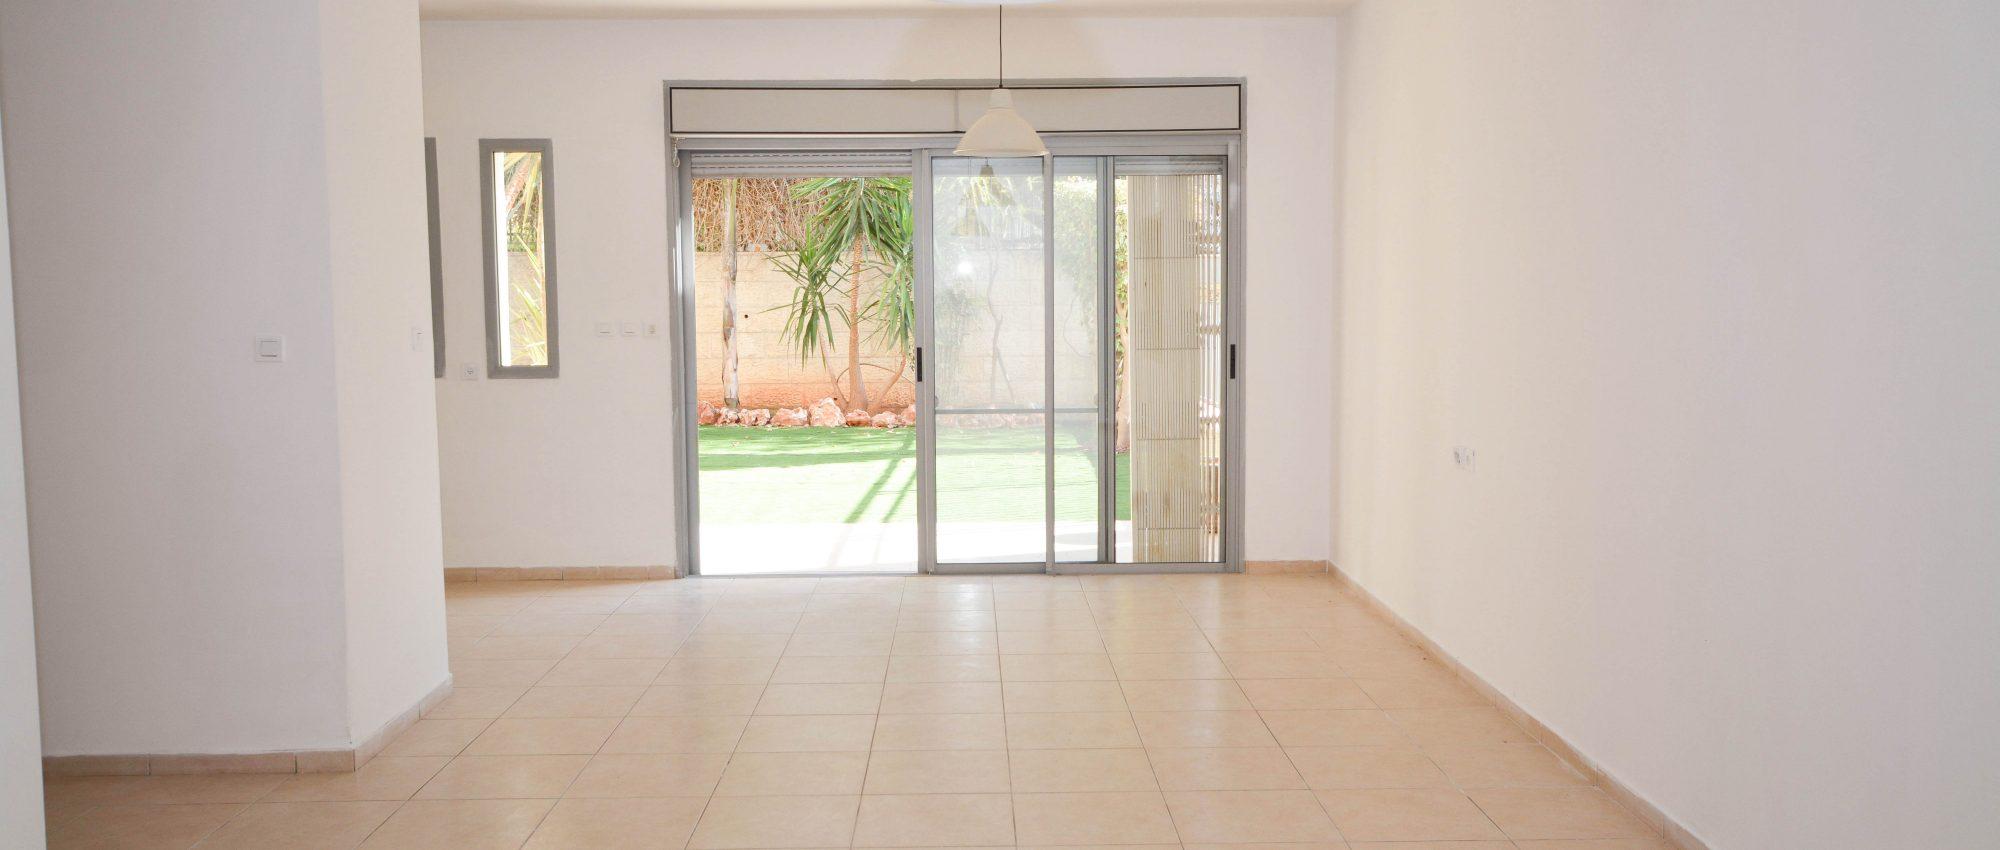 For Rent, 5.5 Room Garden Duplex in North Buchman, Hashvatim